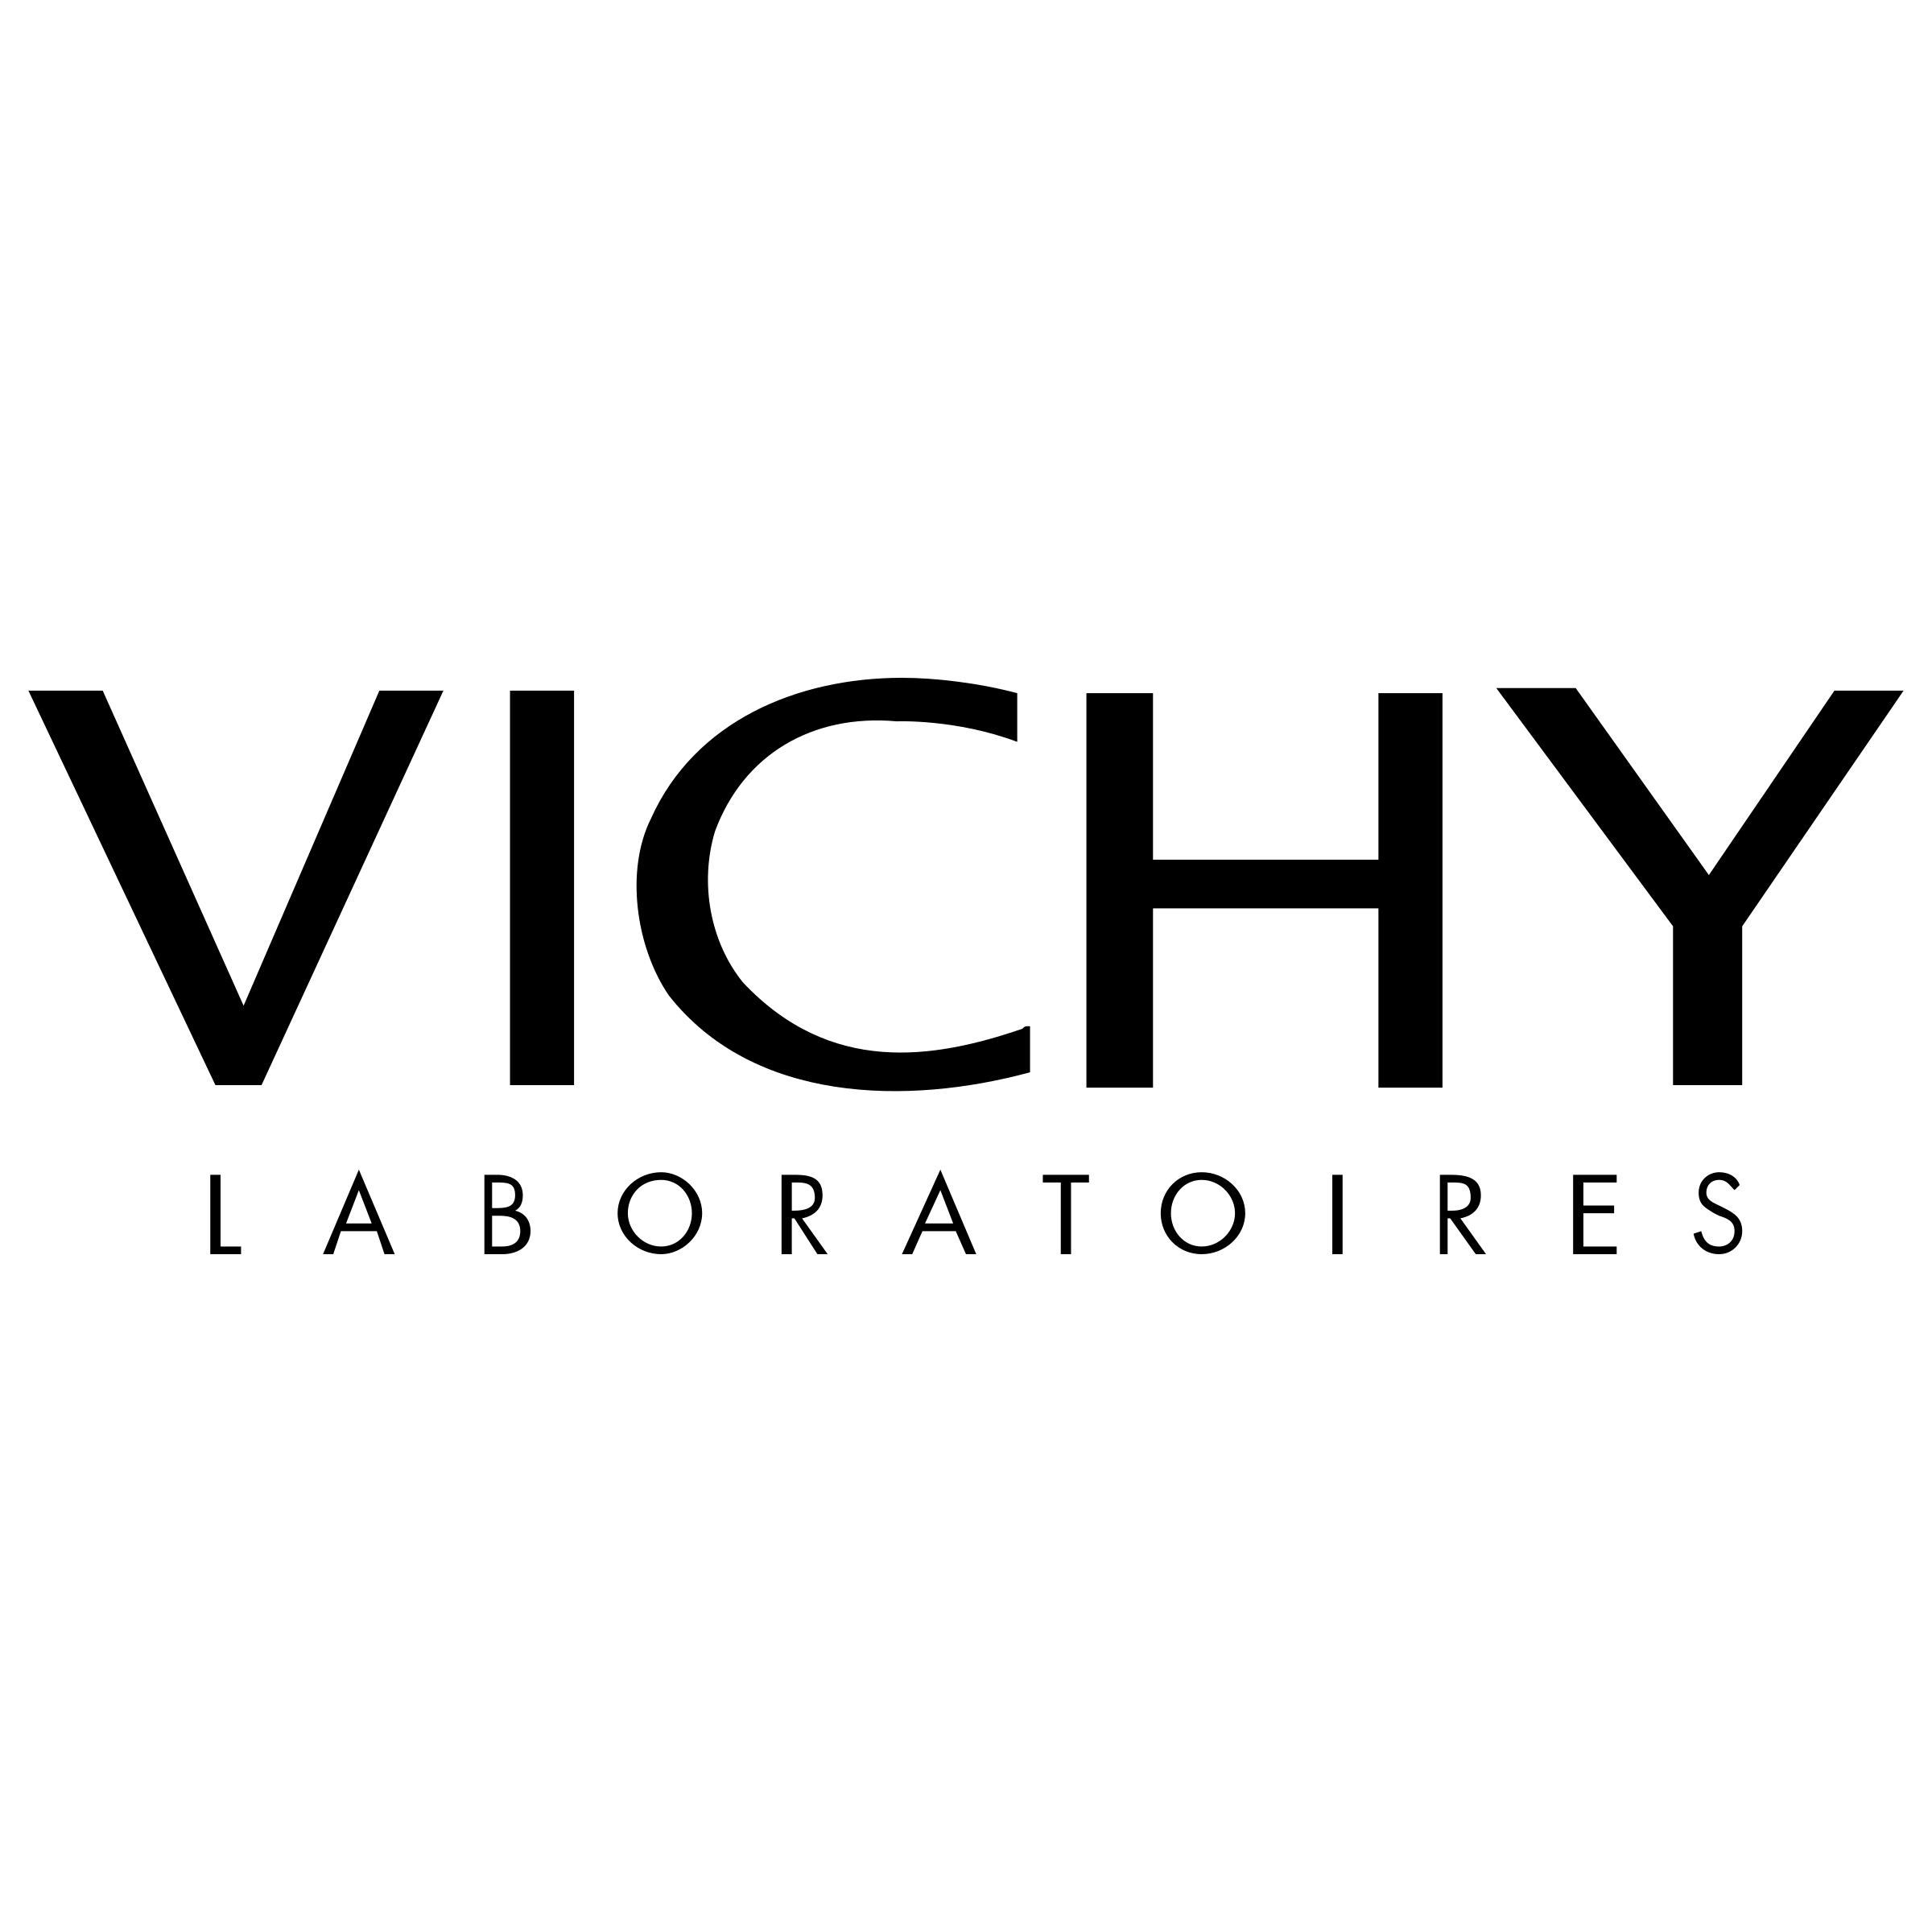 Vichy 1 Logo Png Transparent